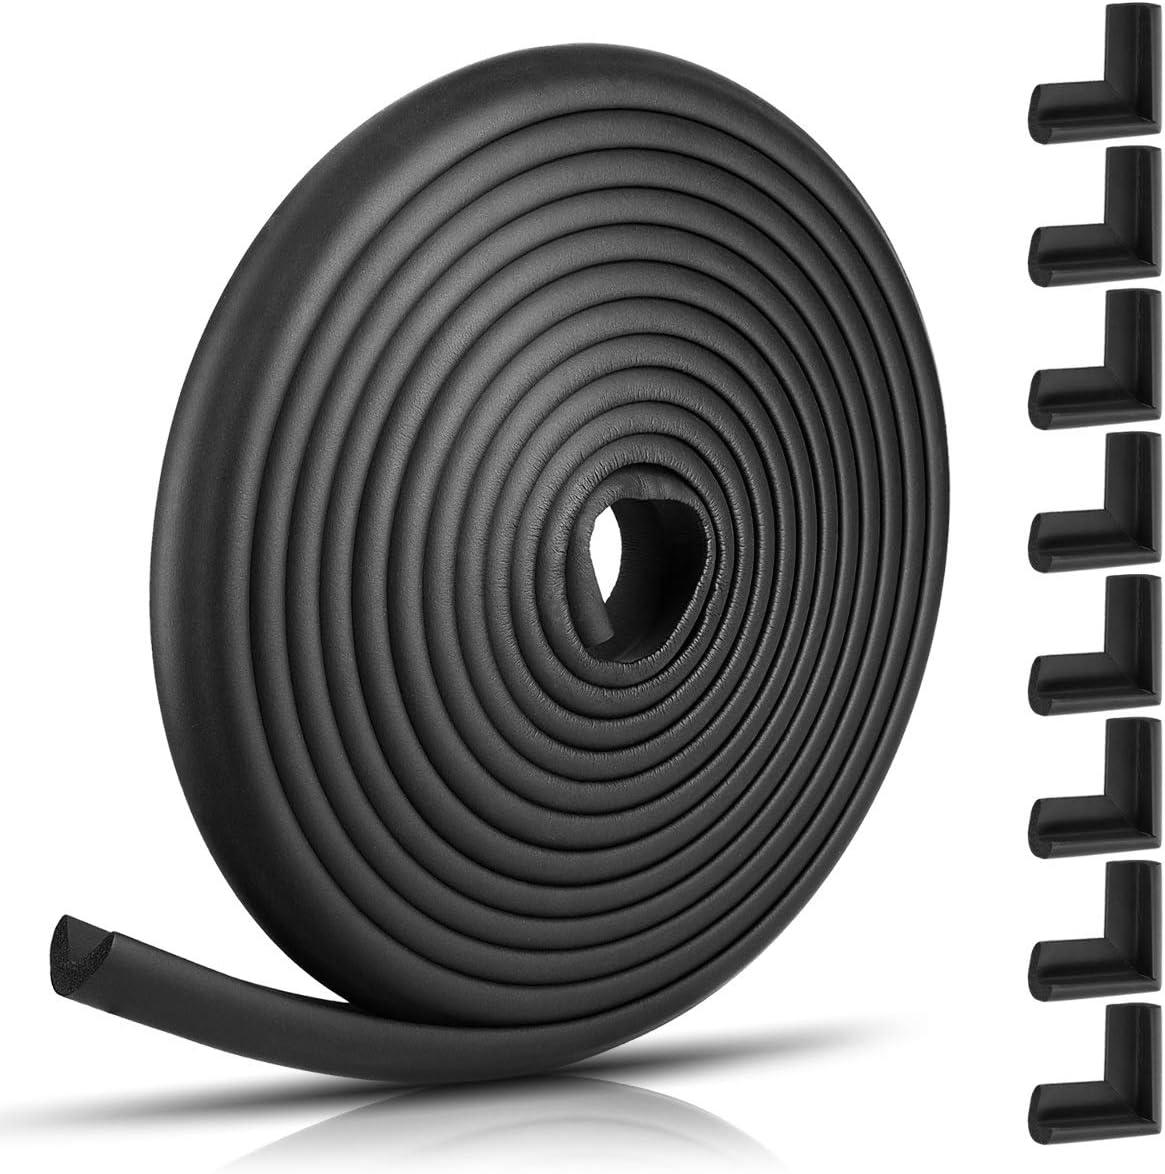 Protector negro Amortiguadores con adhesivo doble cara Navaris protectores para esquinas y bordes 1x Rollo de 6M con 8x topes para esquina